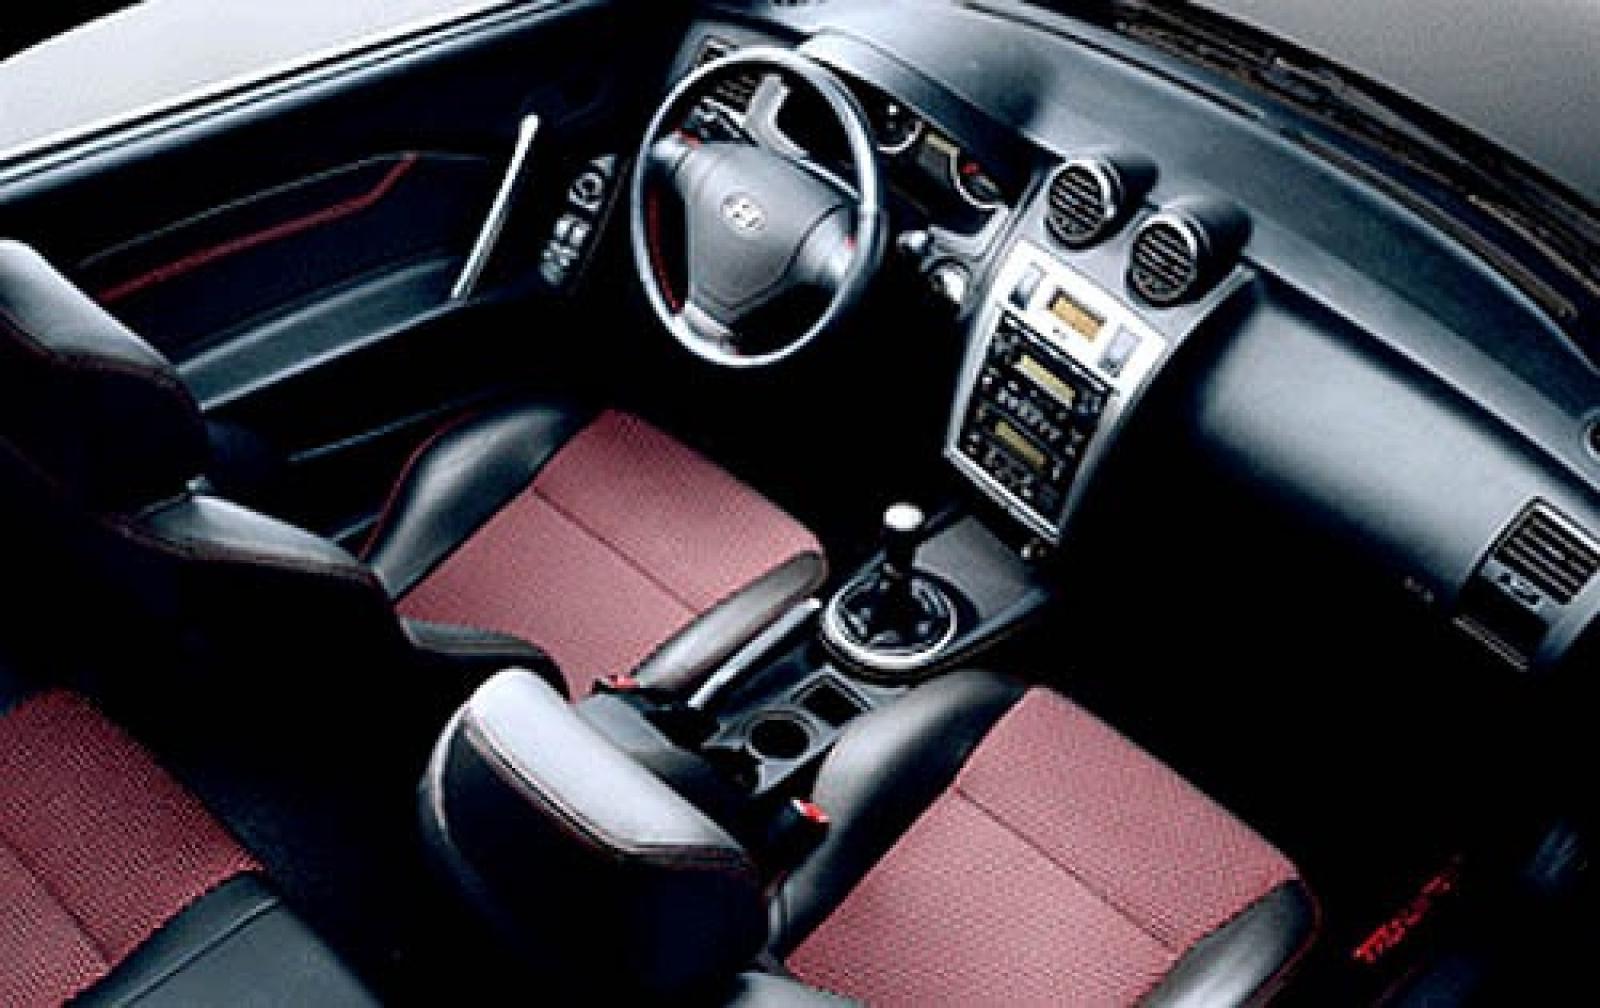 800 1024 1280 1600 Origin 2005 Hyundai Tiburon